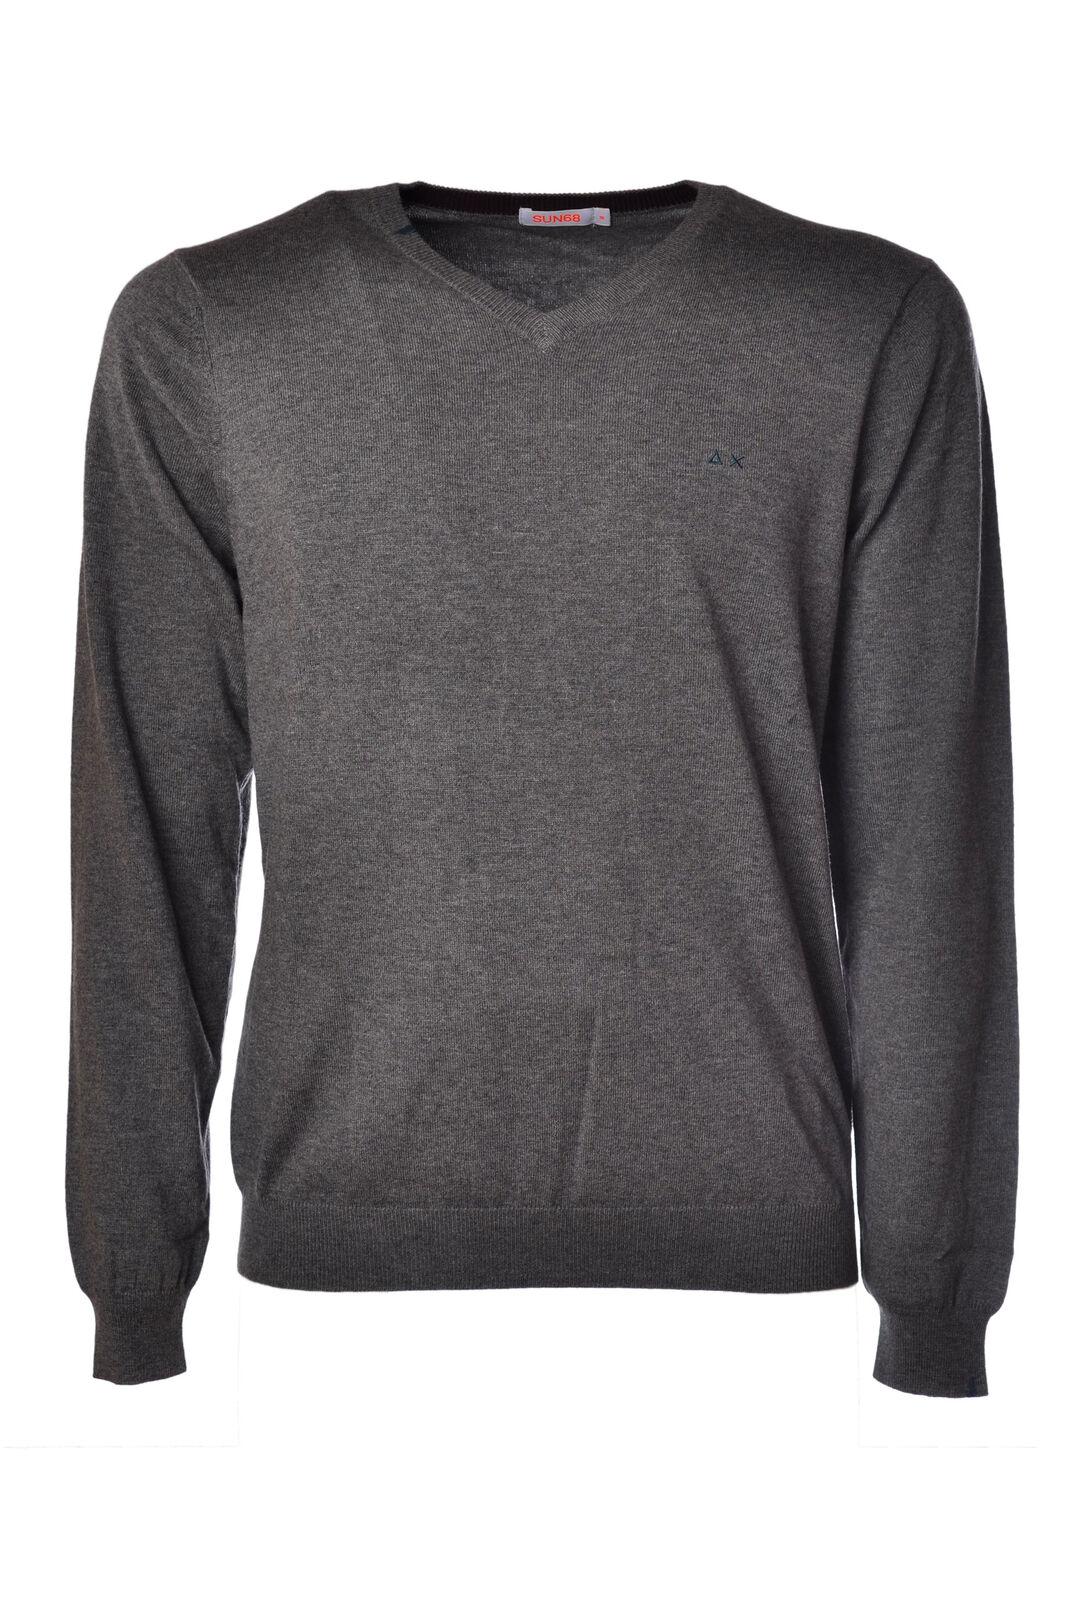 Sun 68 68 68 - Knitwear-Sweaters - Man - grigio - 922718C182135 2076f1